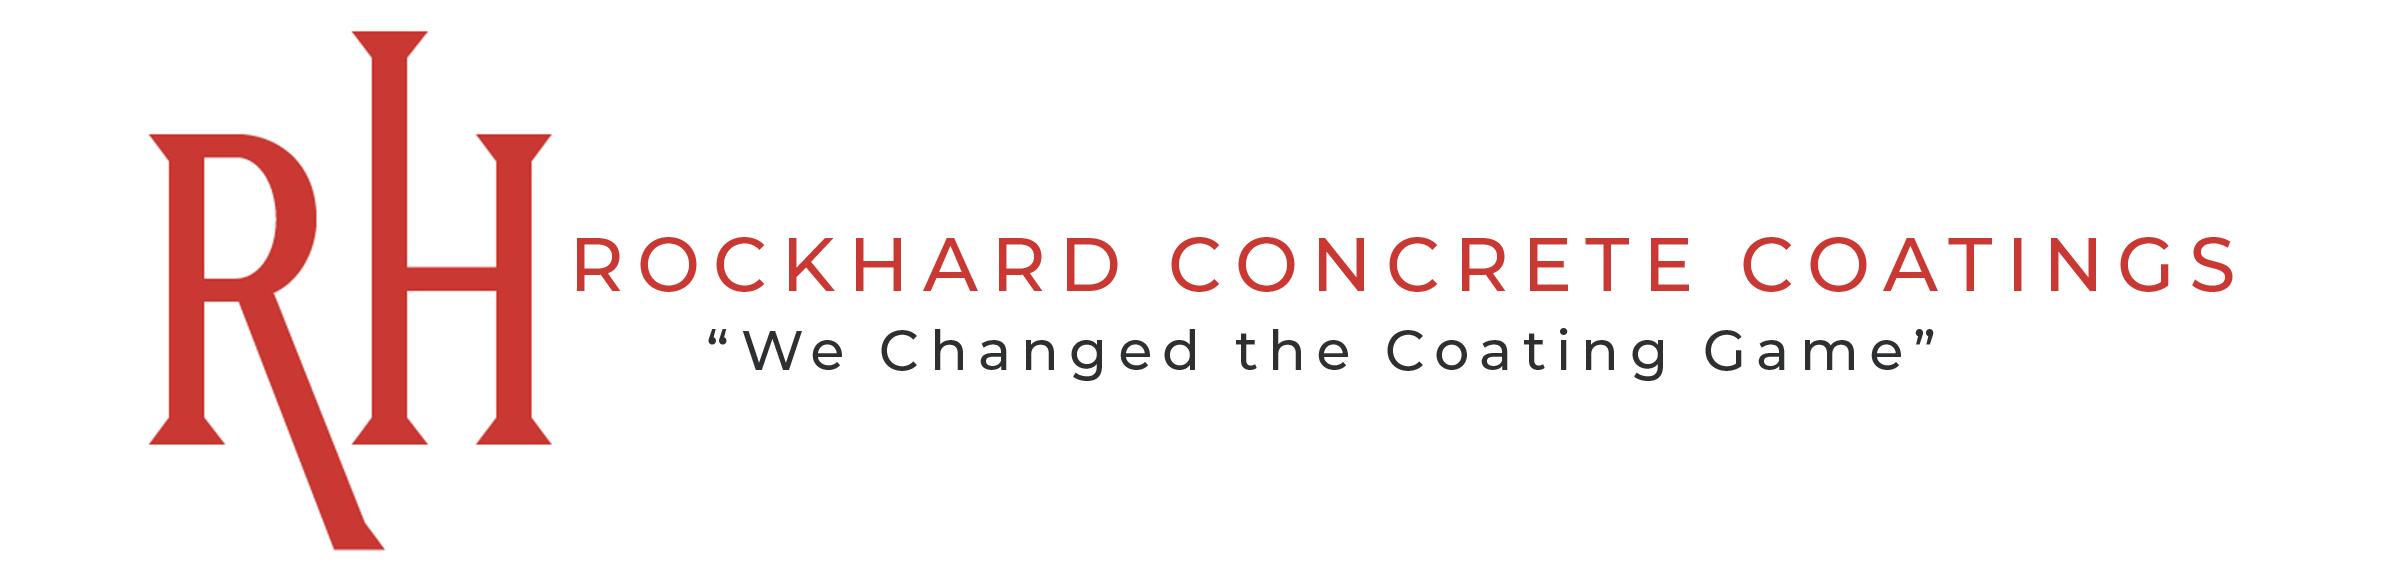 Rockhard Concrete Coatings